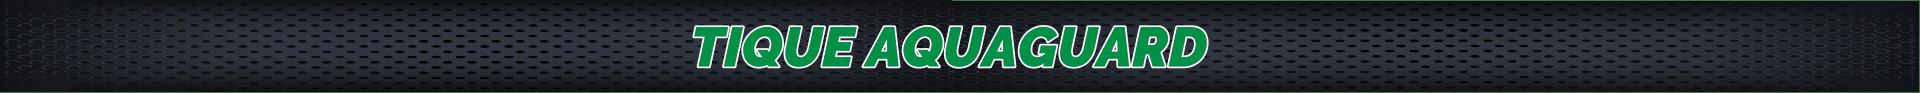 full_width_tique_aquaguard_banner-min